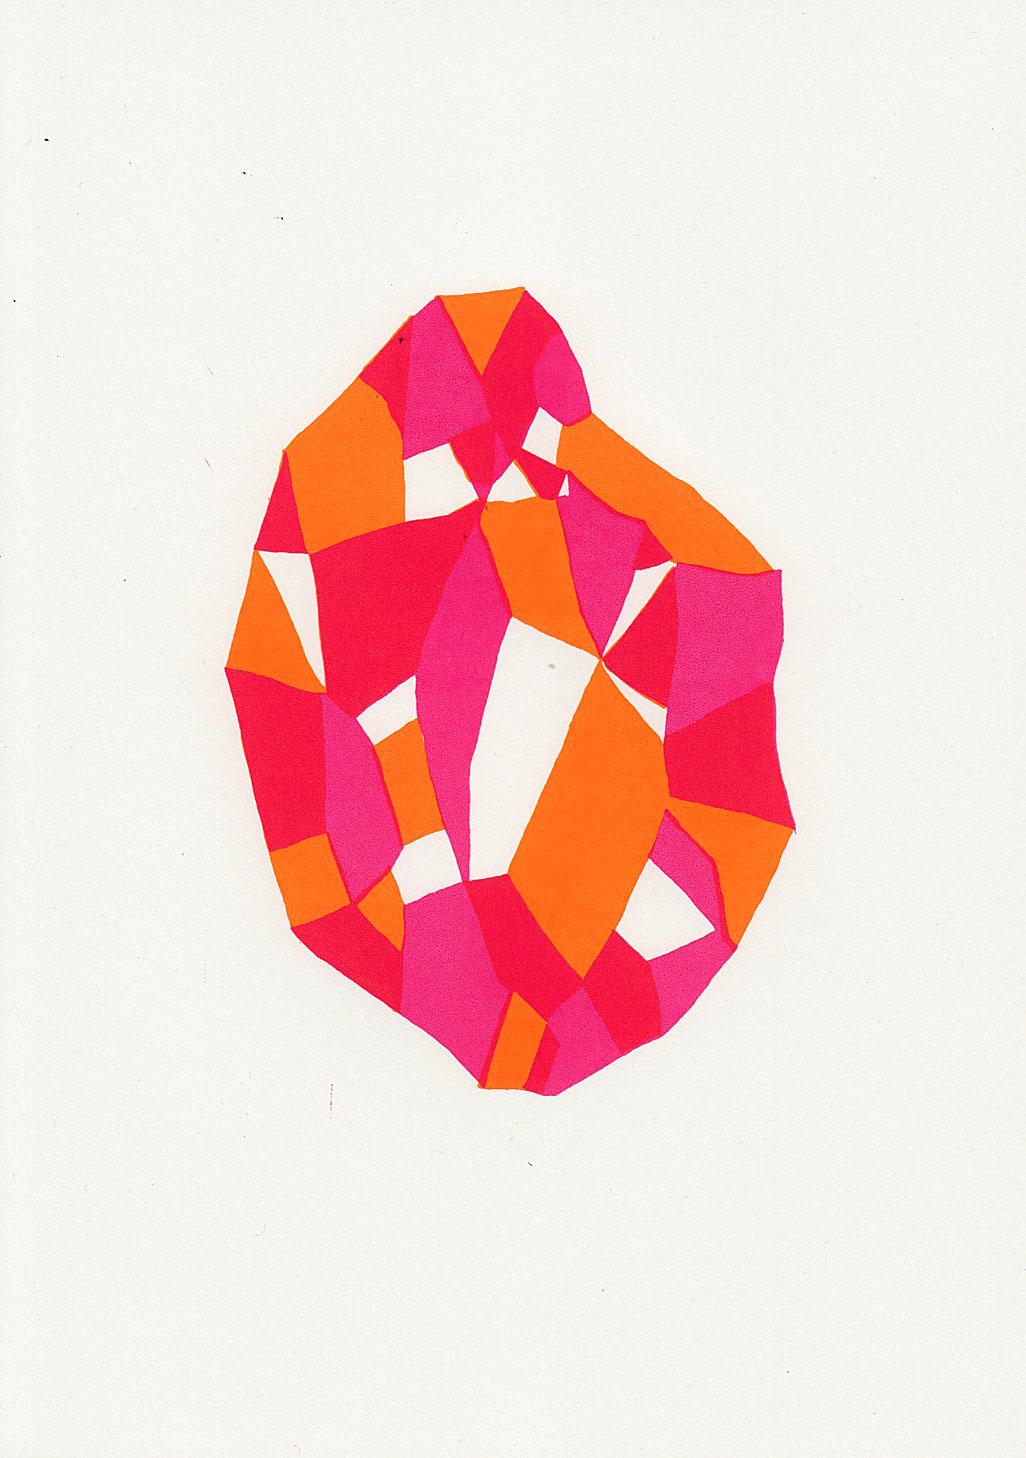 silkscreen print of a gemstone in pink and orange